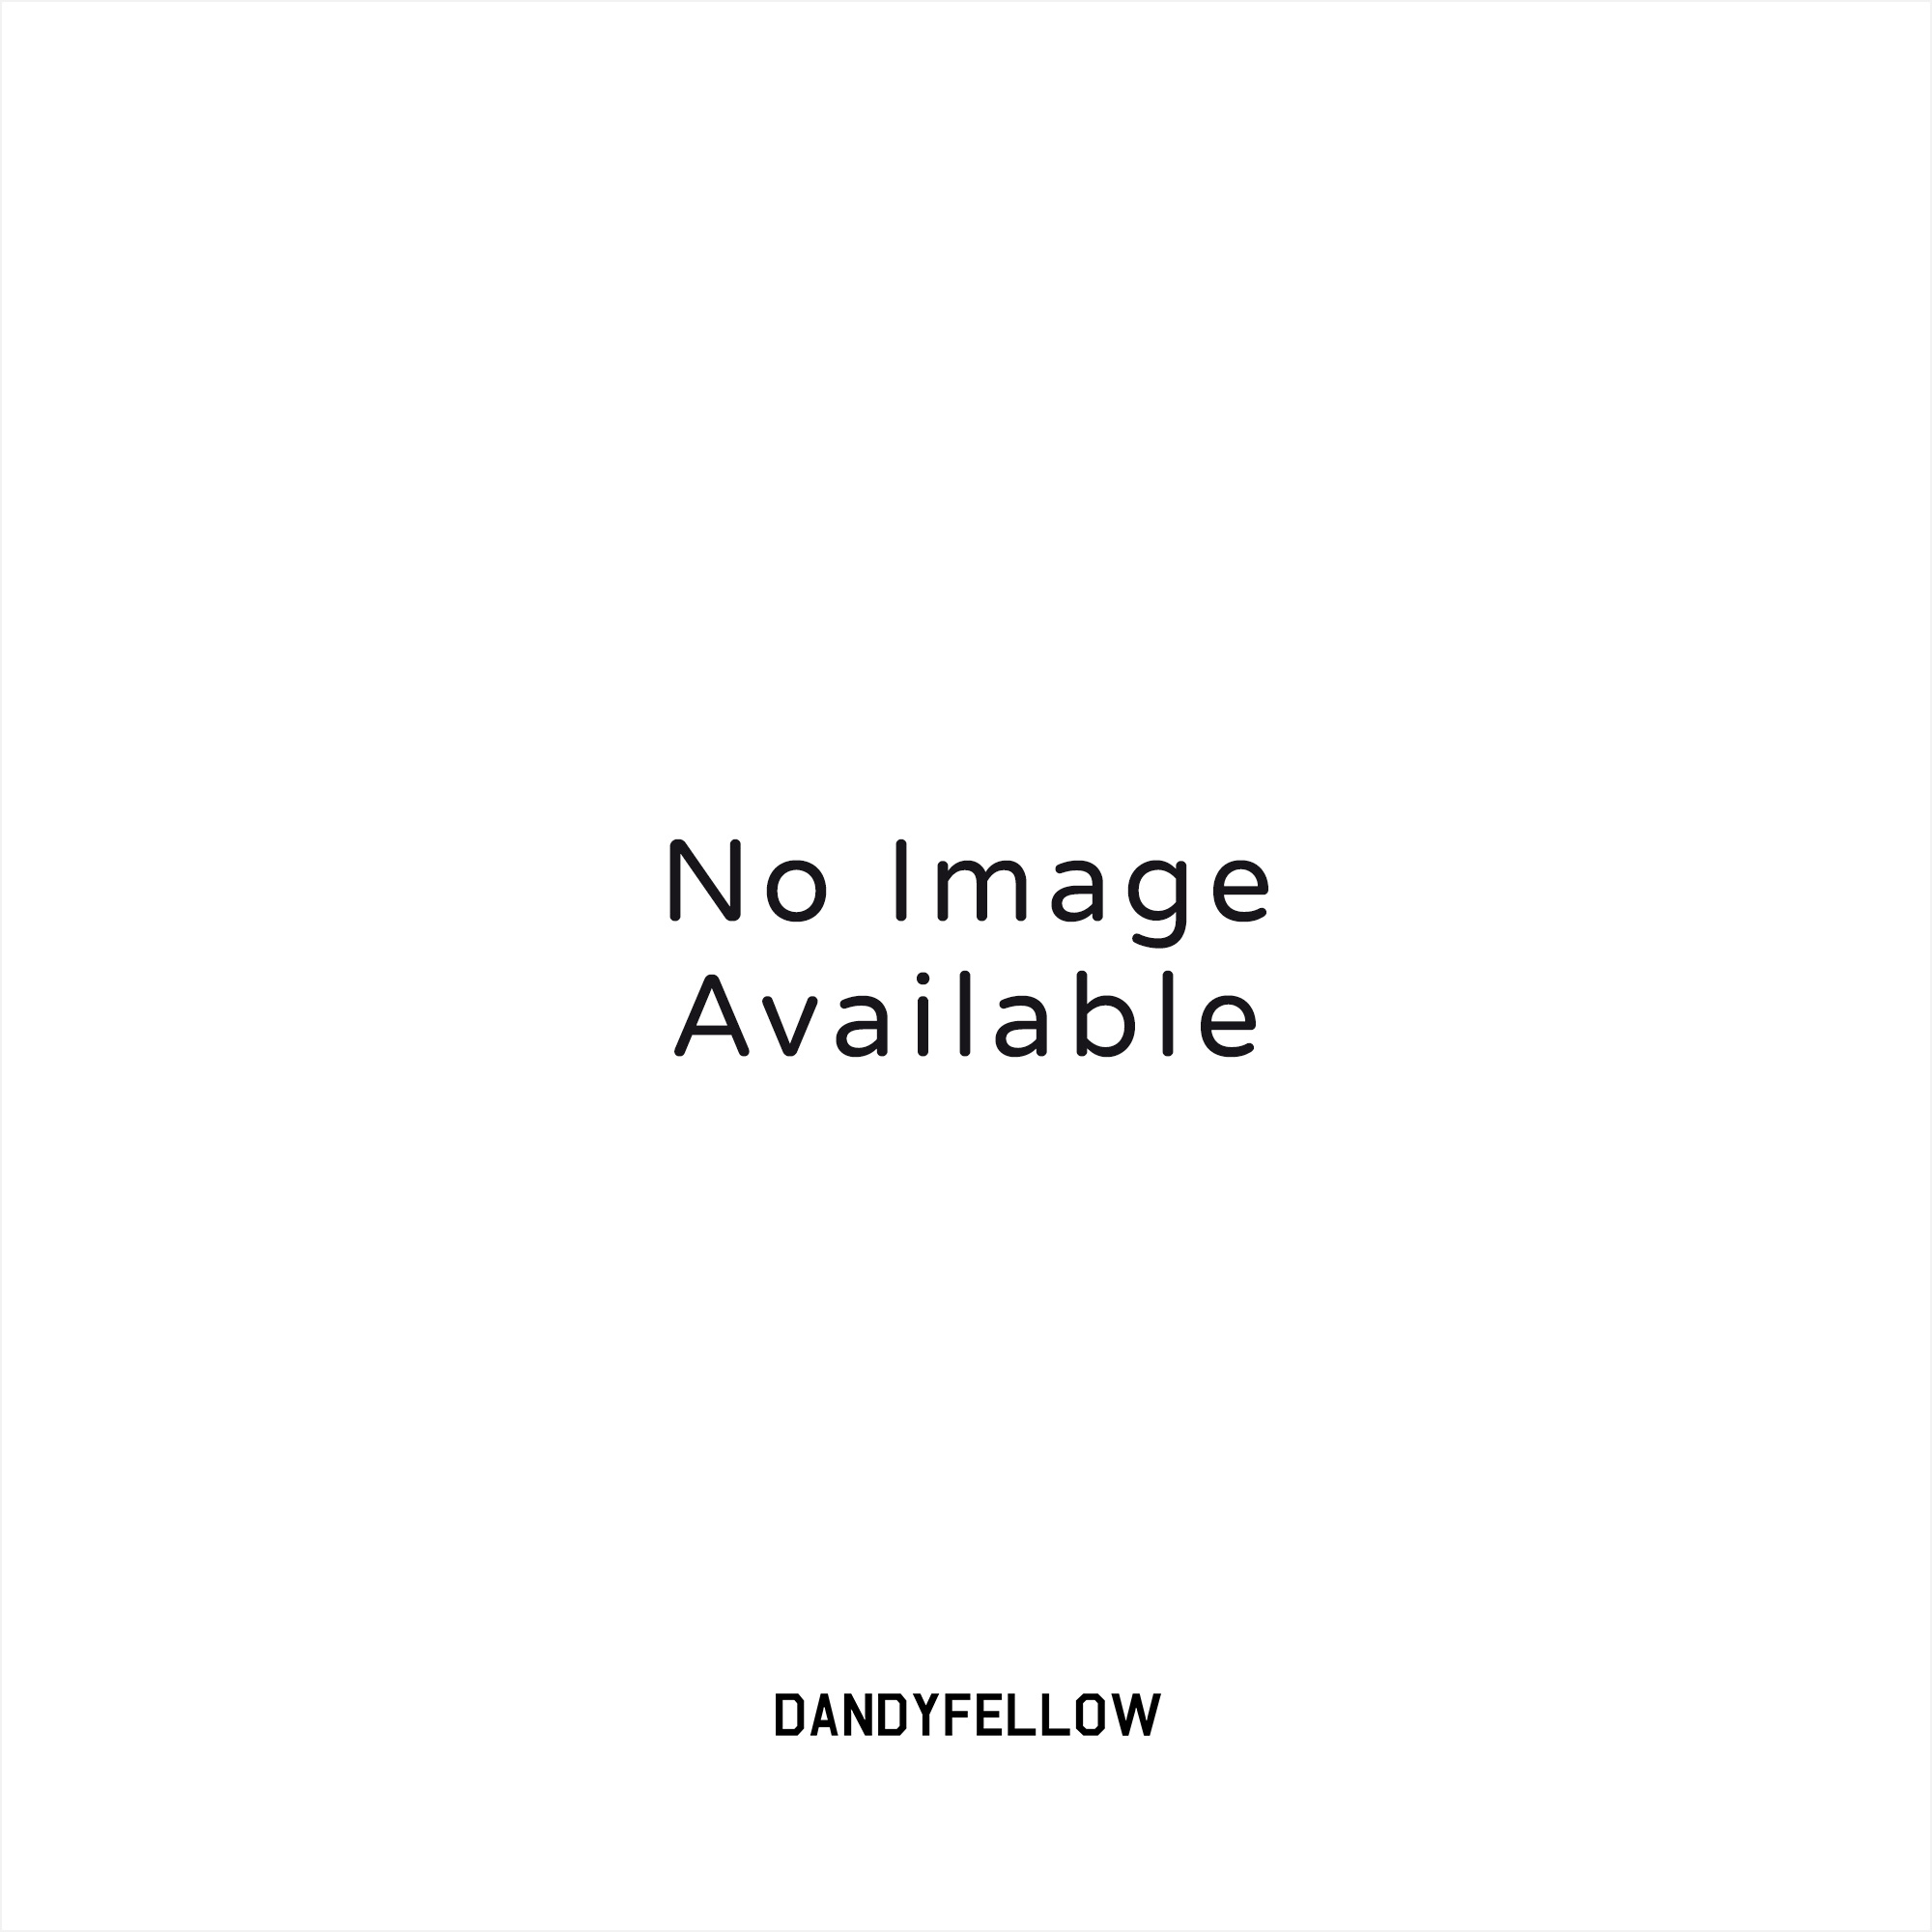 Paul Smith Zebra Grey Pique Polo Shirt JPFJ-183K-ZEBRA